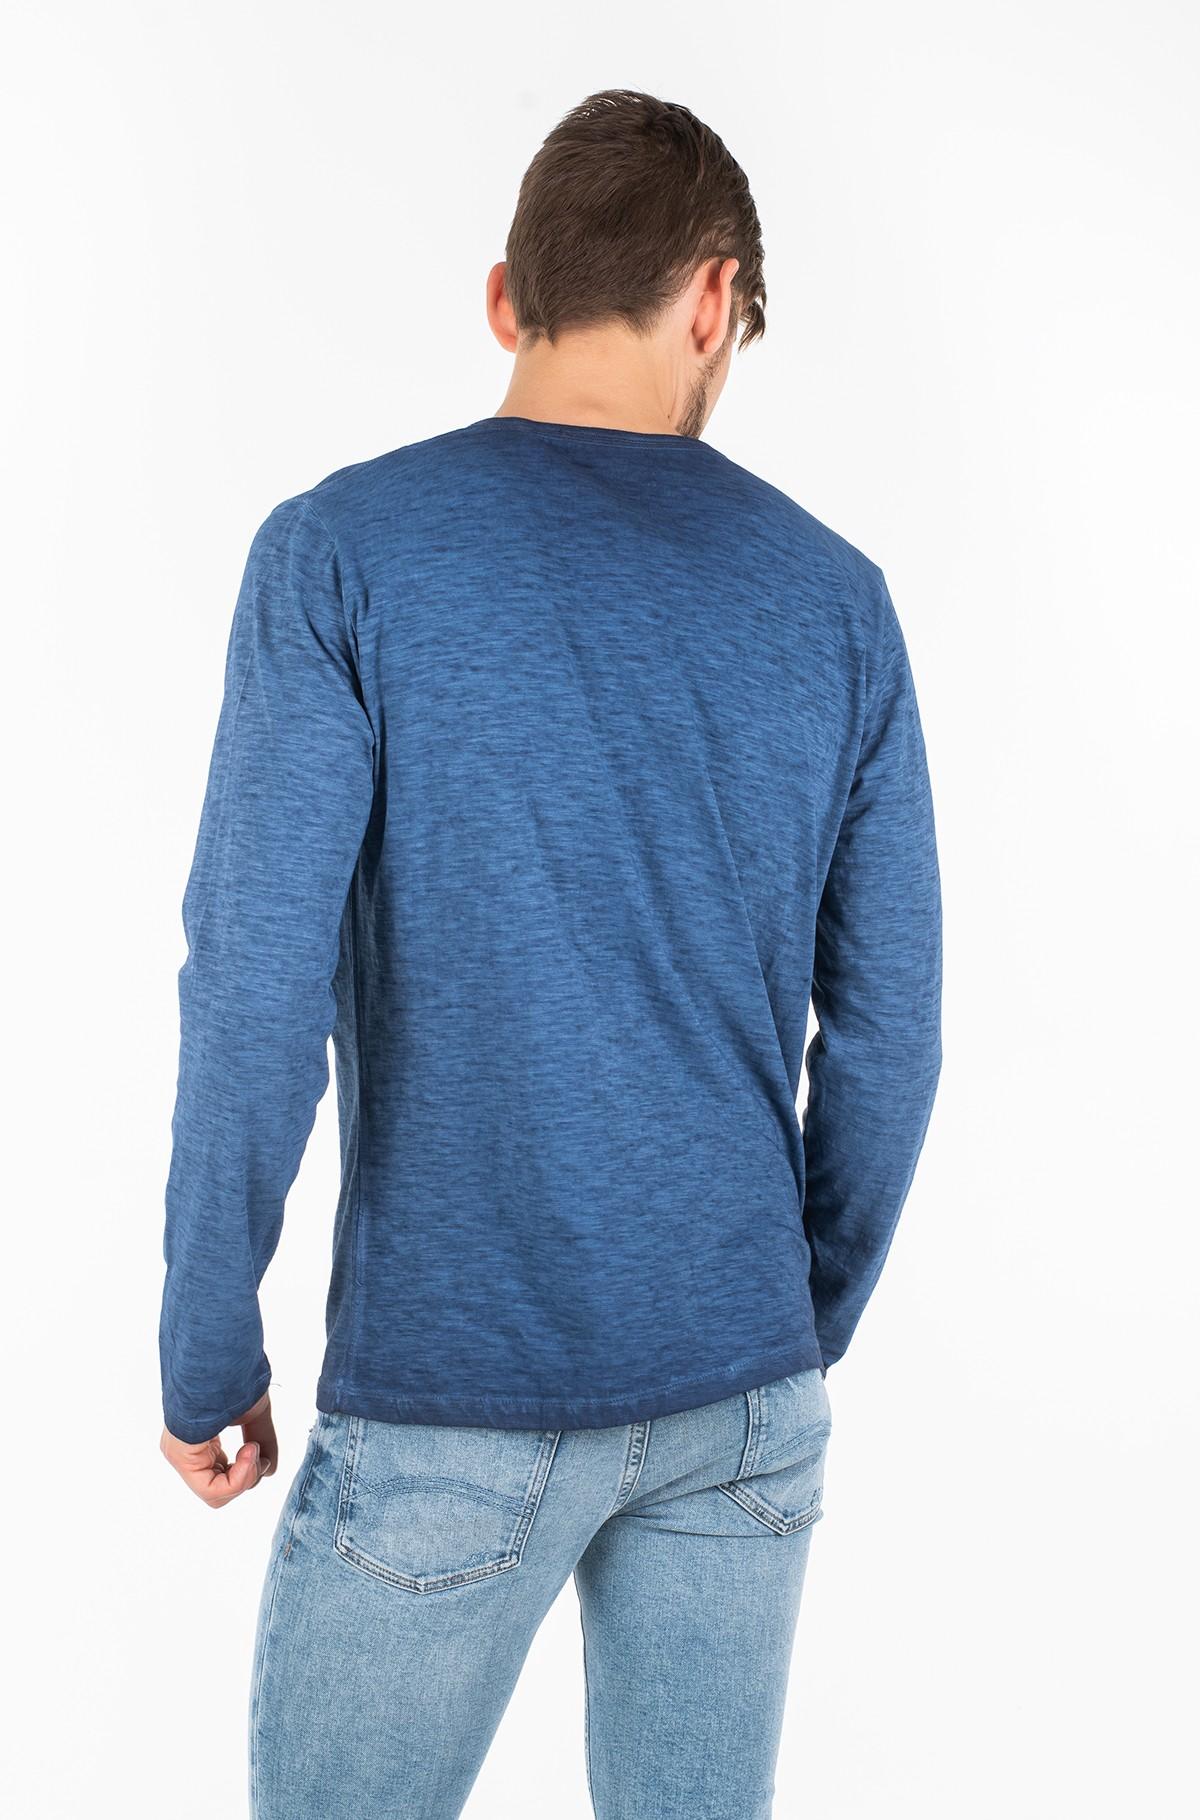 Long sleeved t-shirt DURAN LS/PM506551-full-2